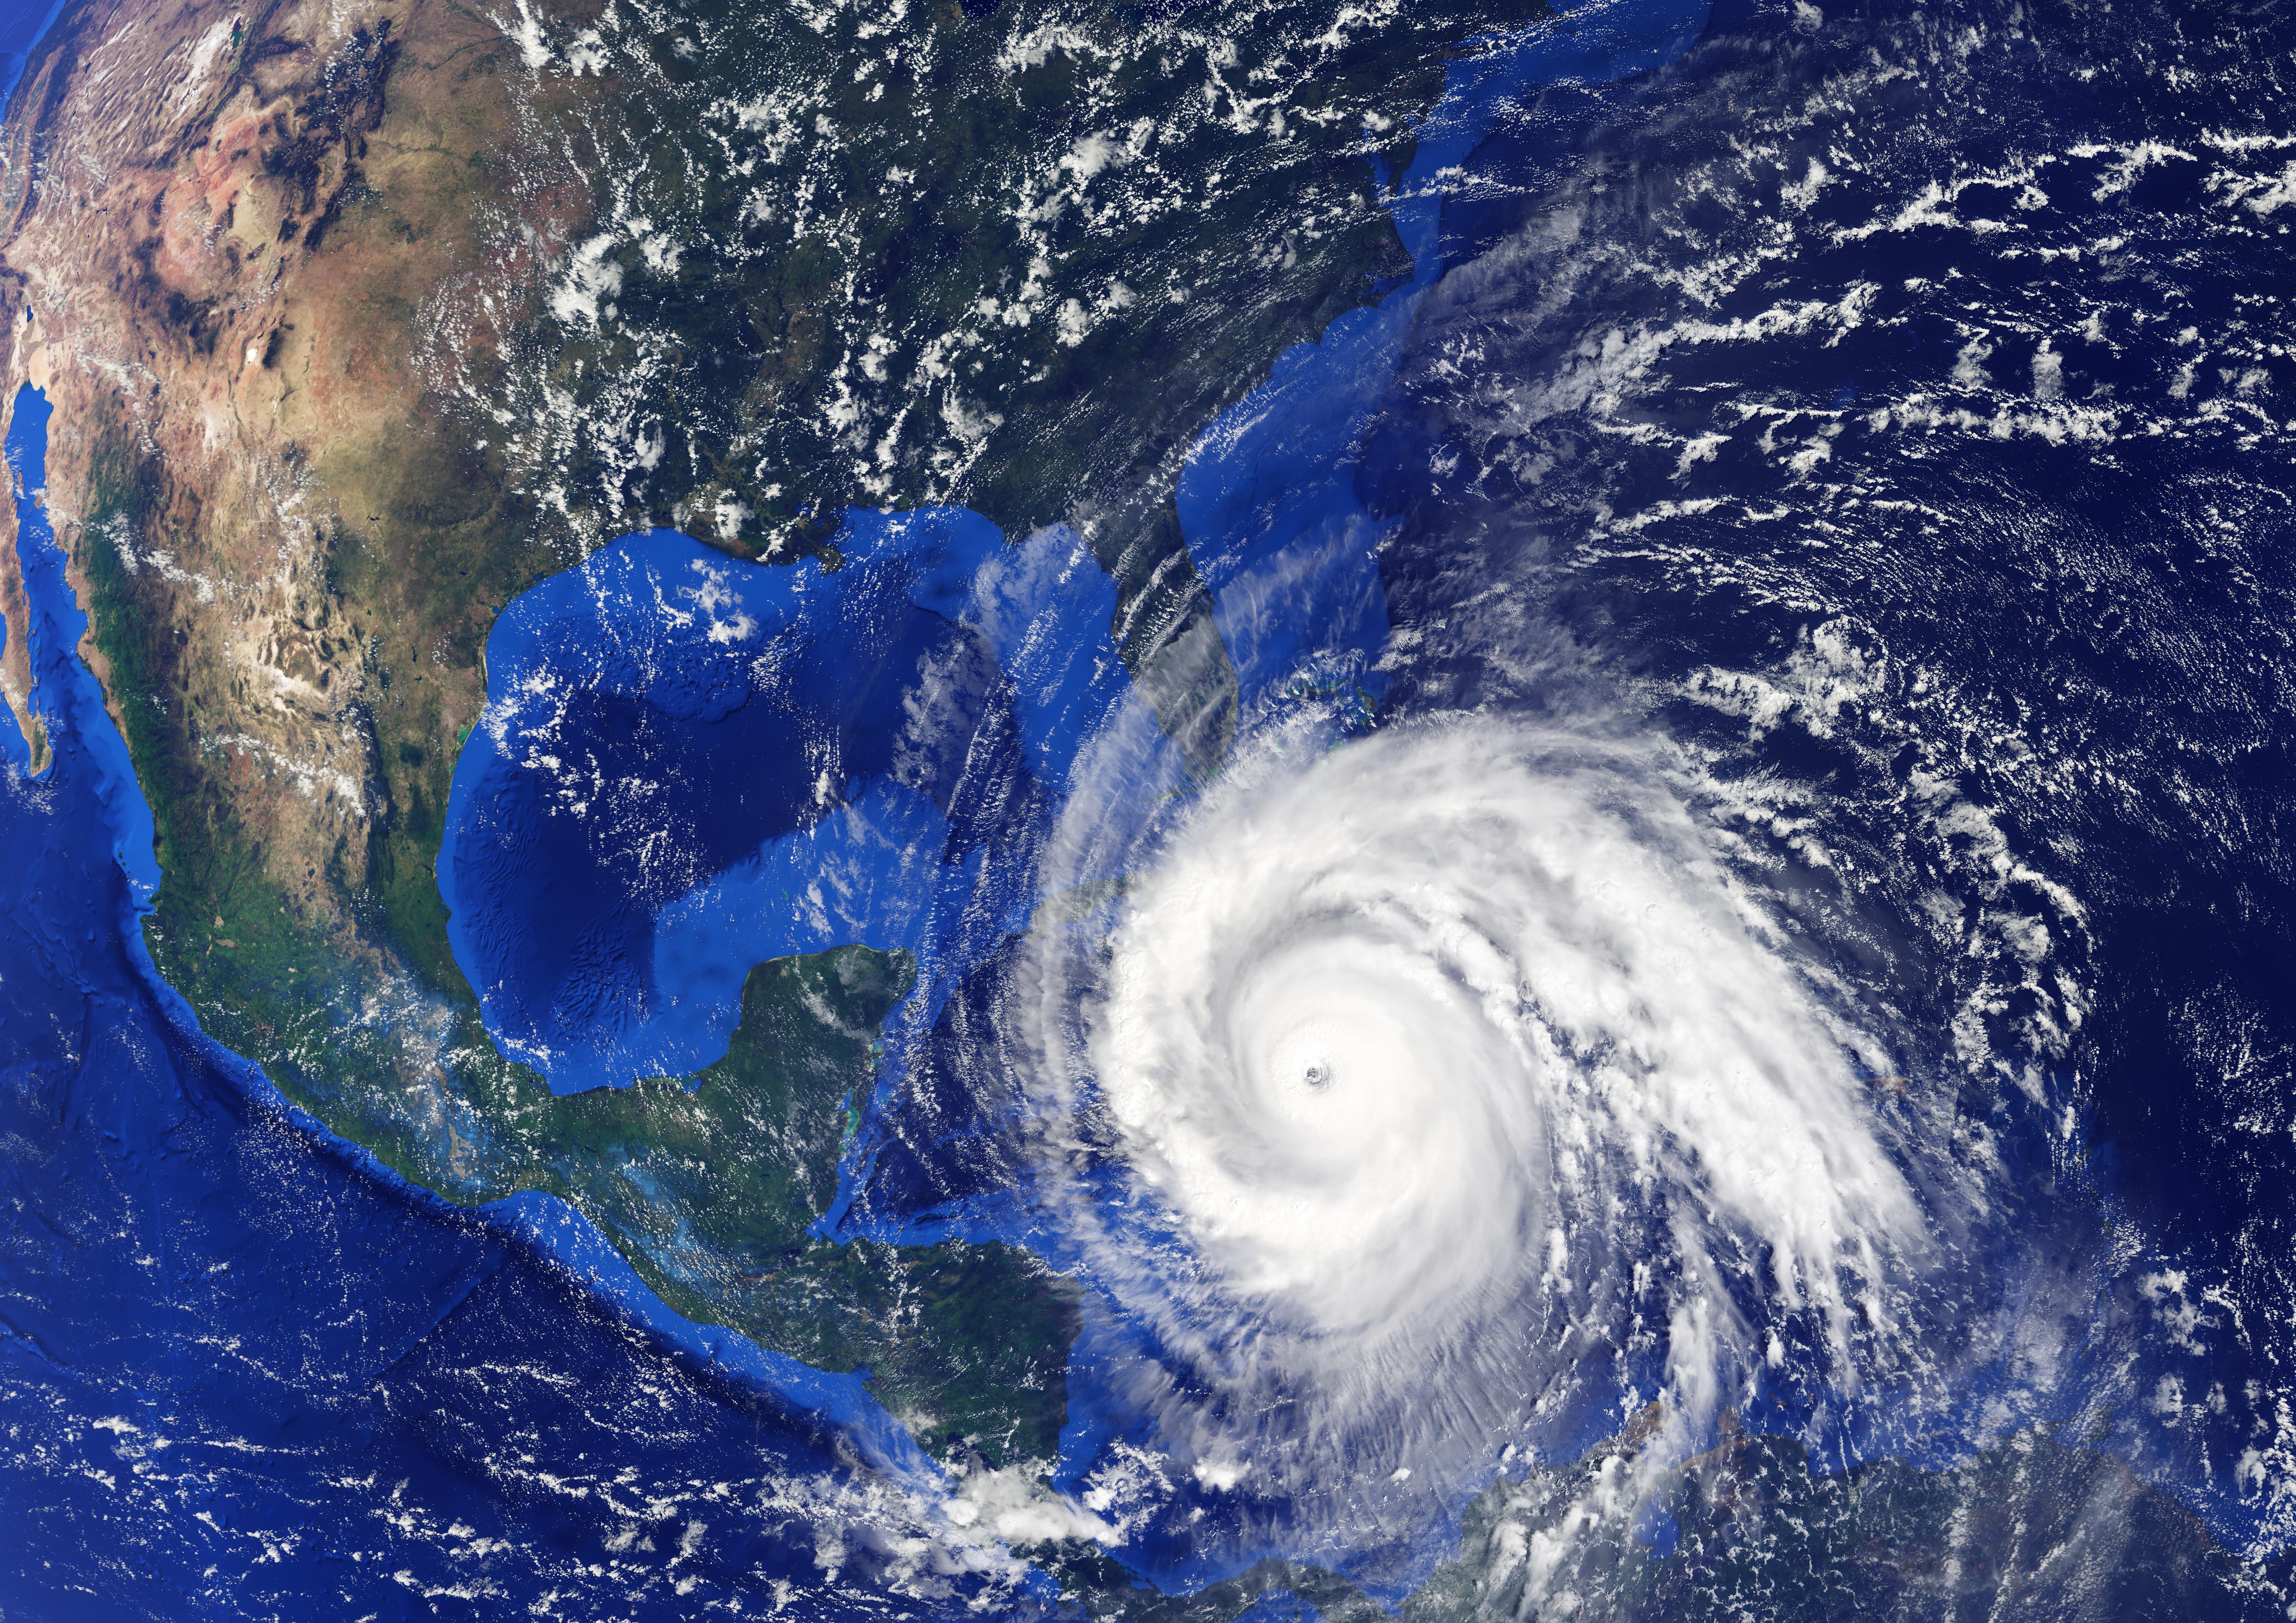 Preparing for Hurricane Dorian